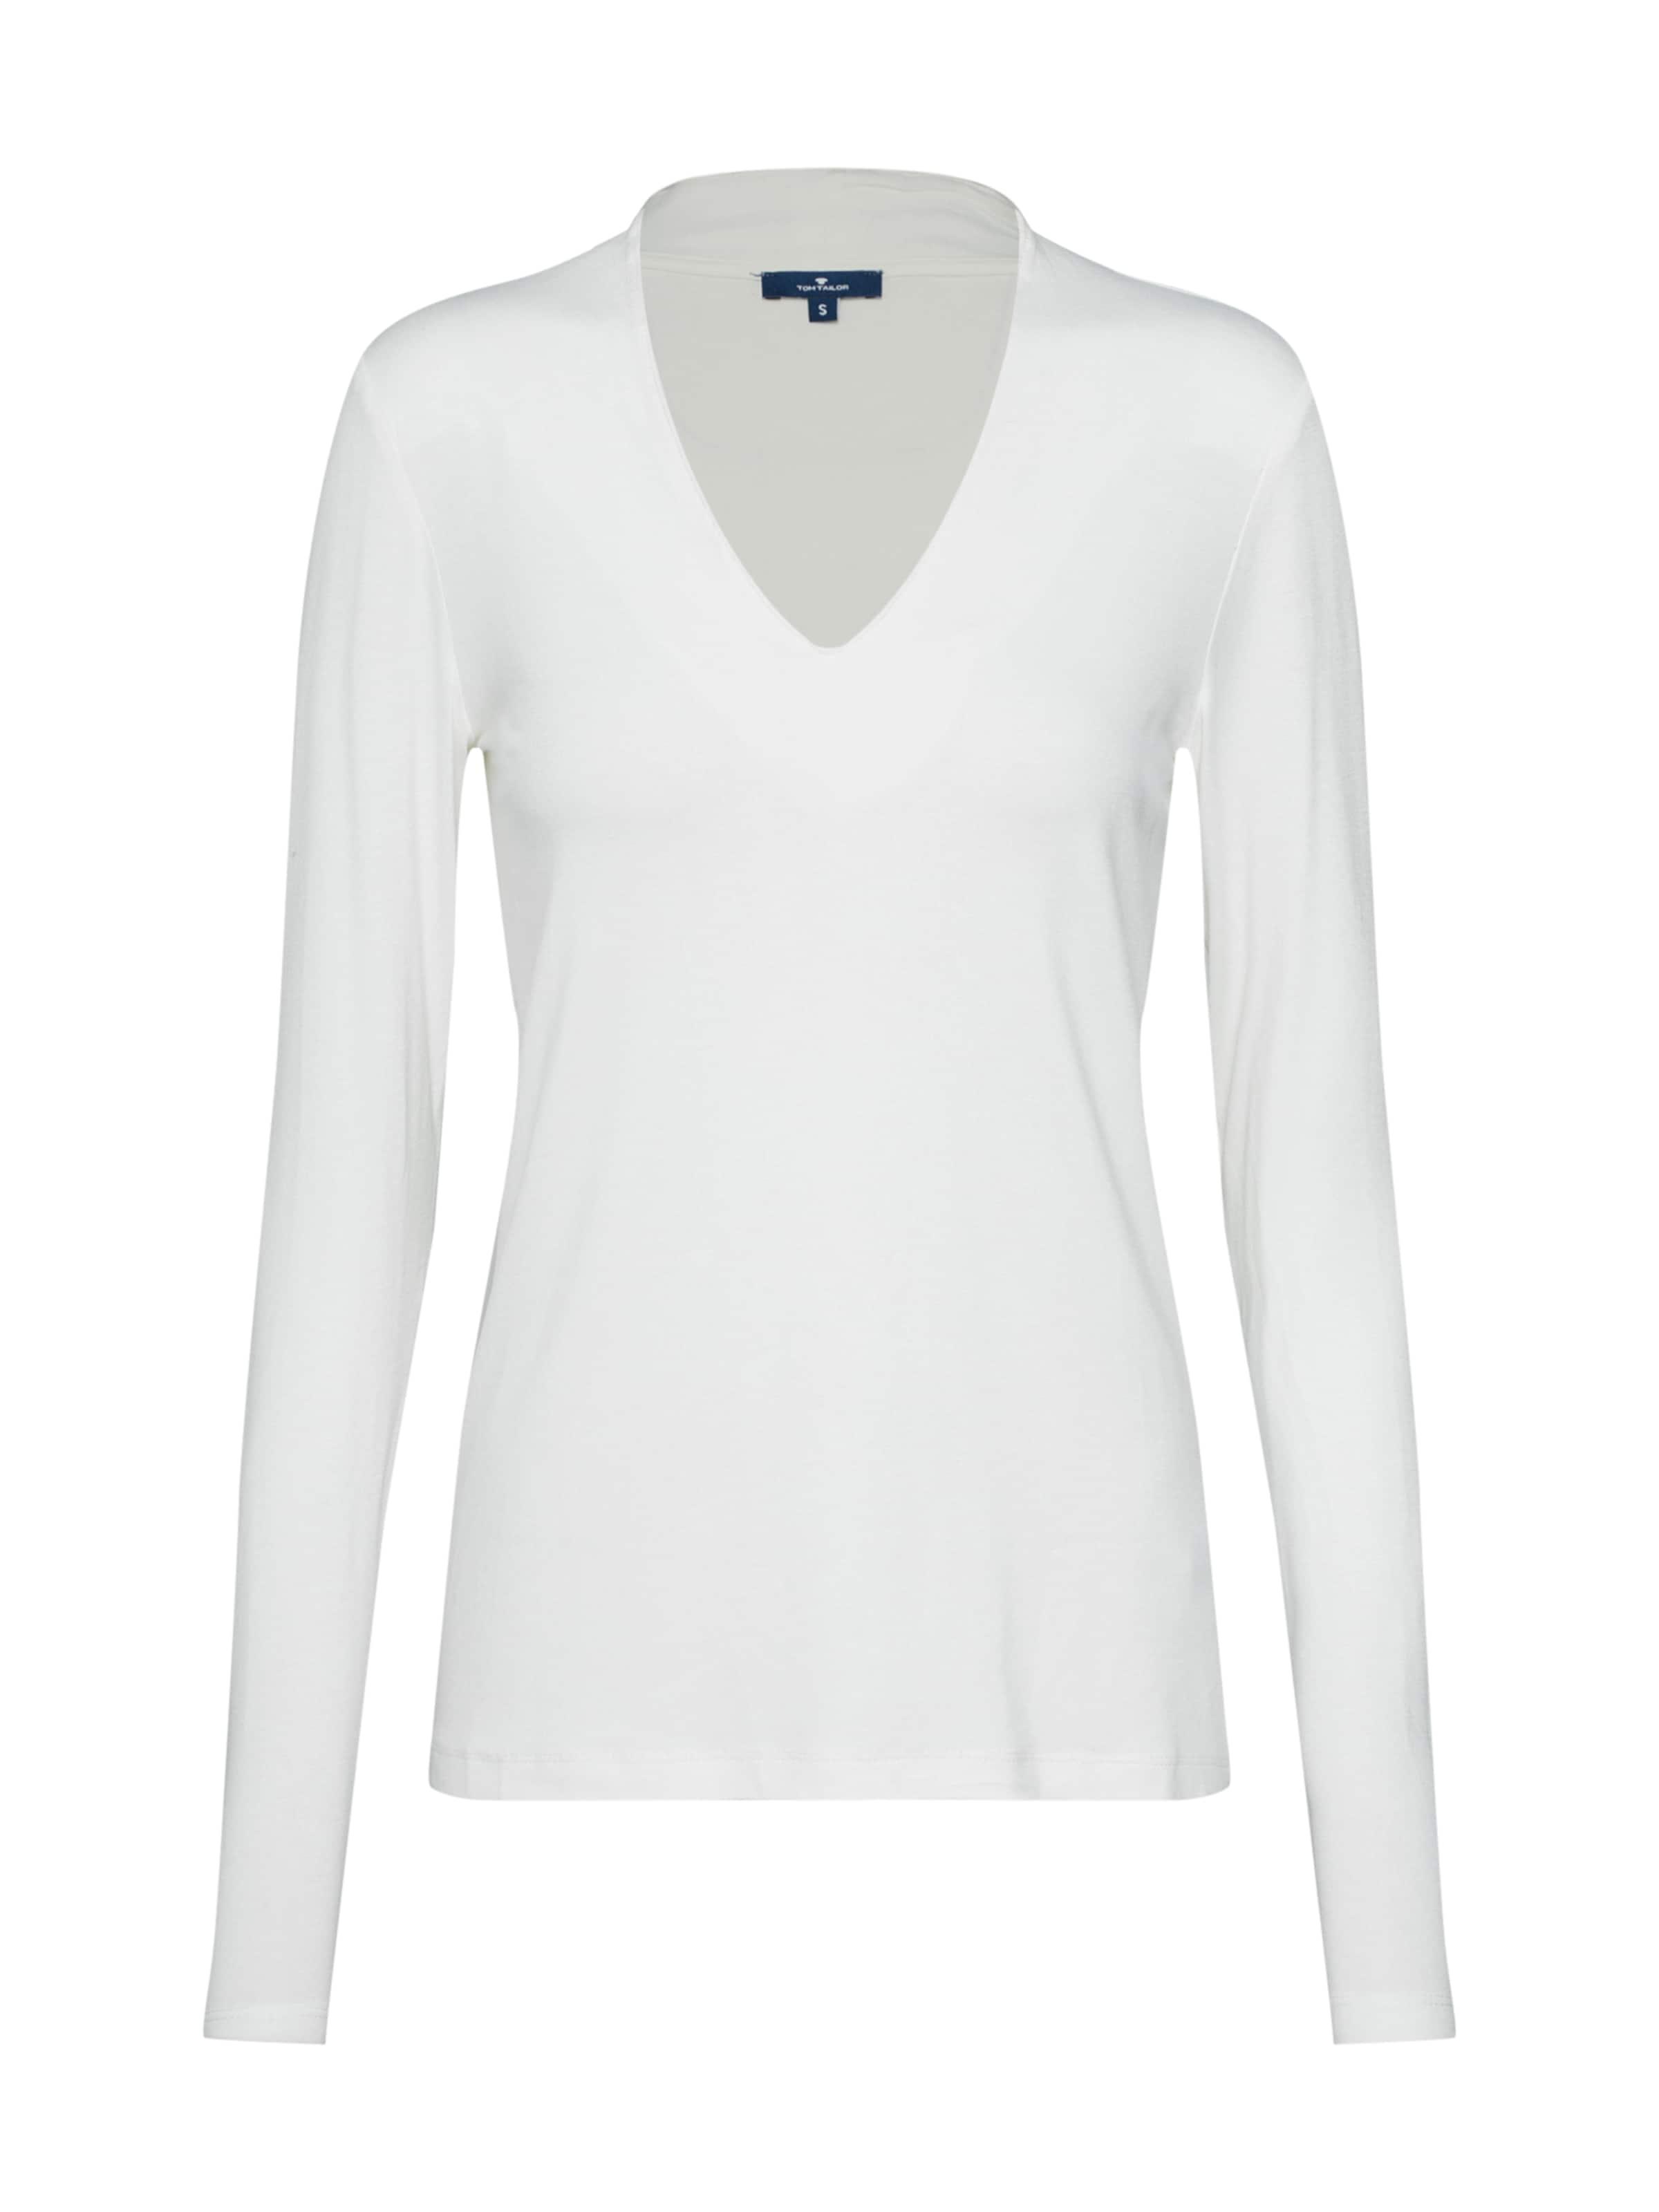 En Tailor Tom shirt Naturel Blanc T dxeCoB